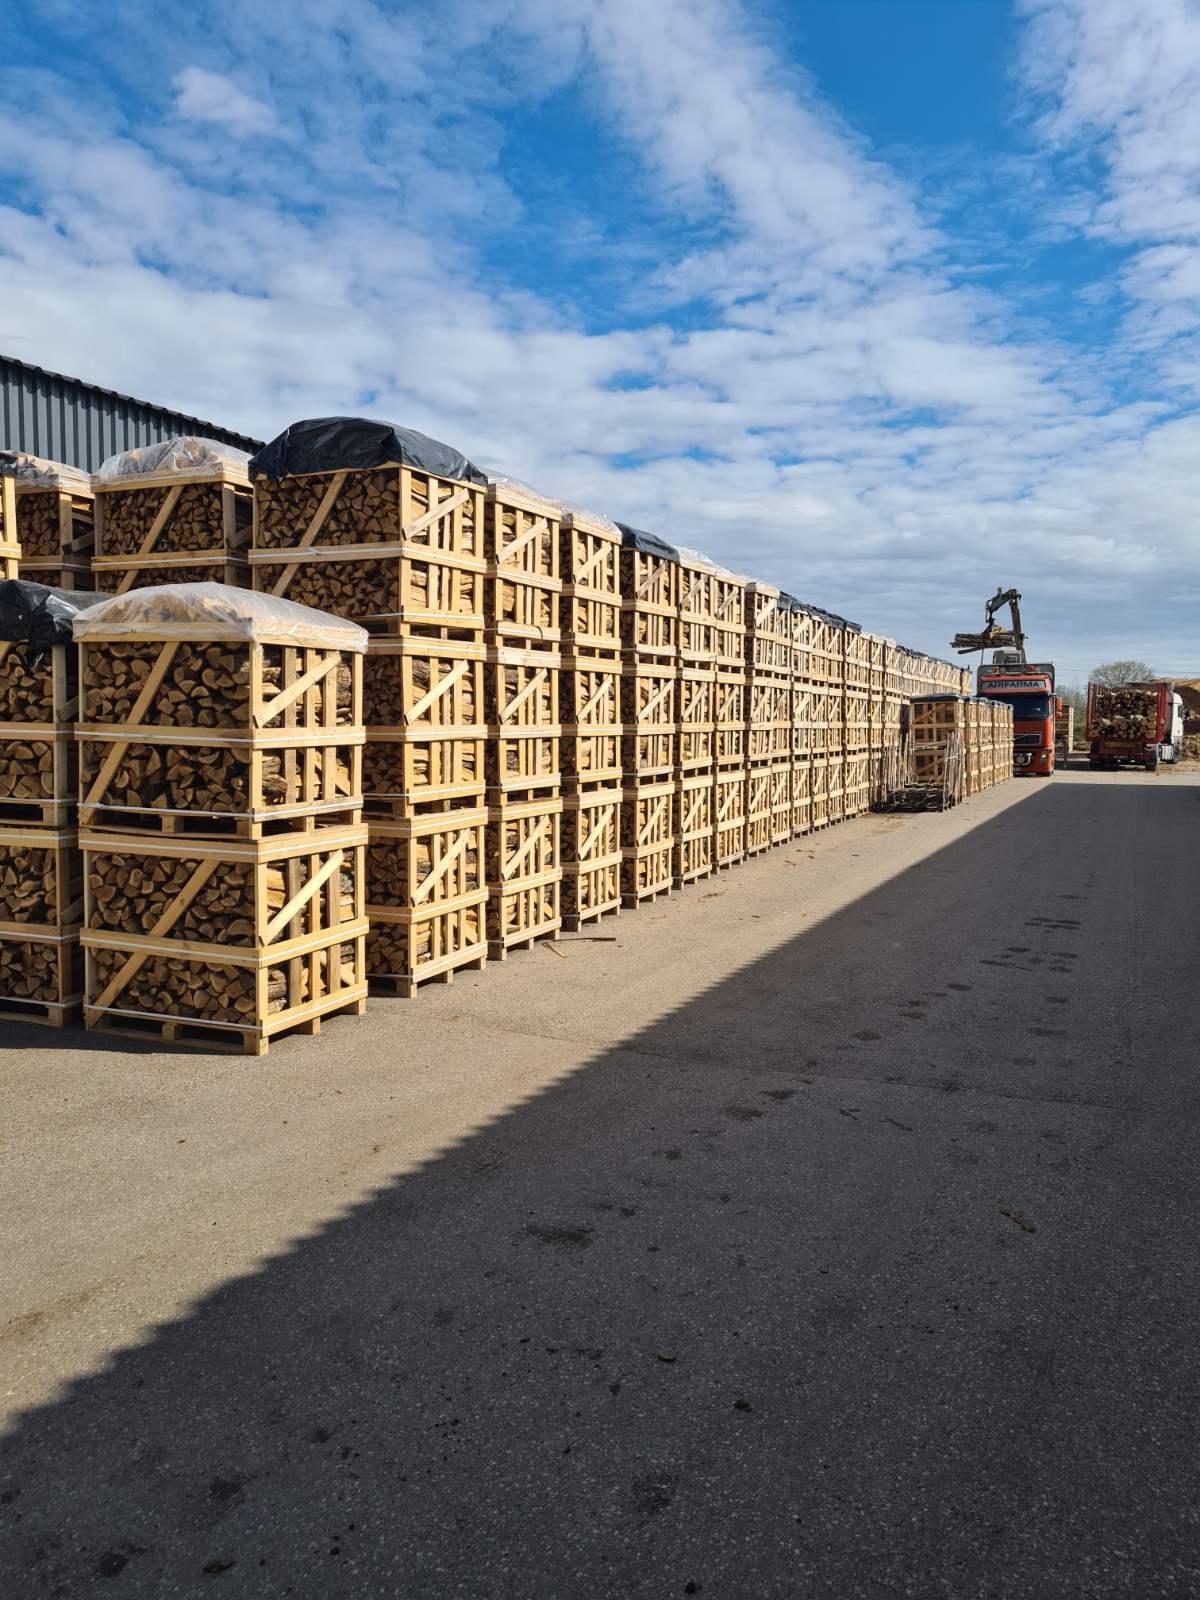 Malkų gamyba ir prekyba